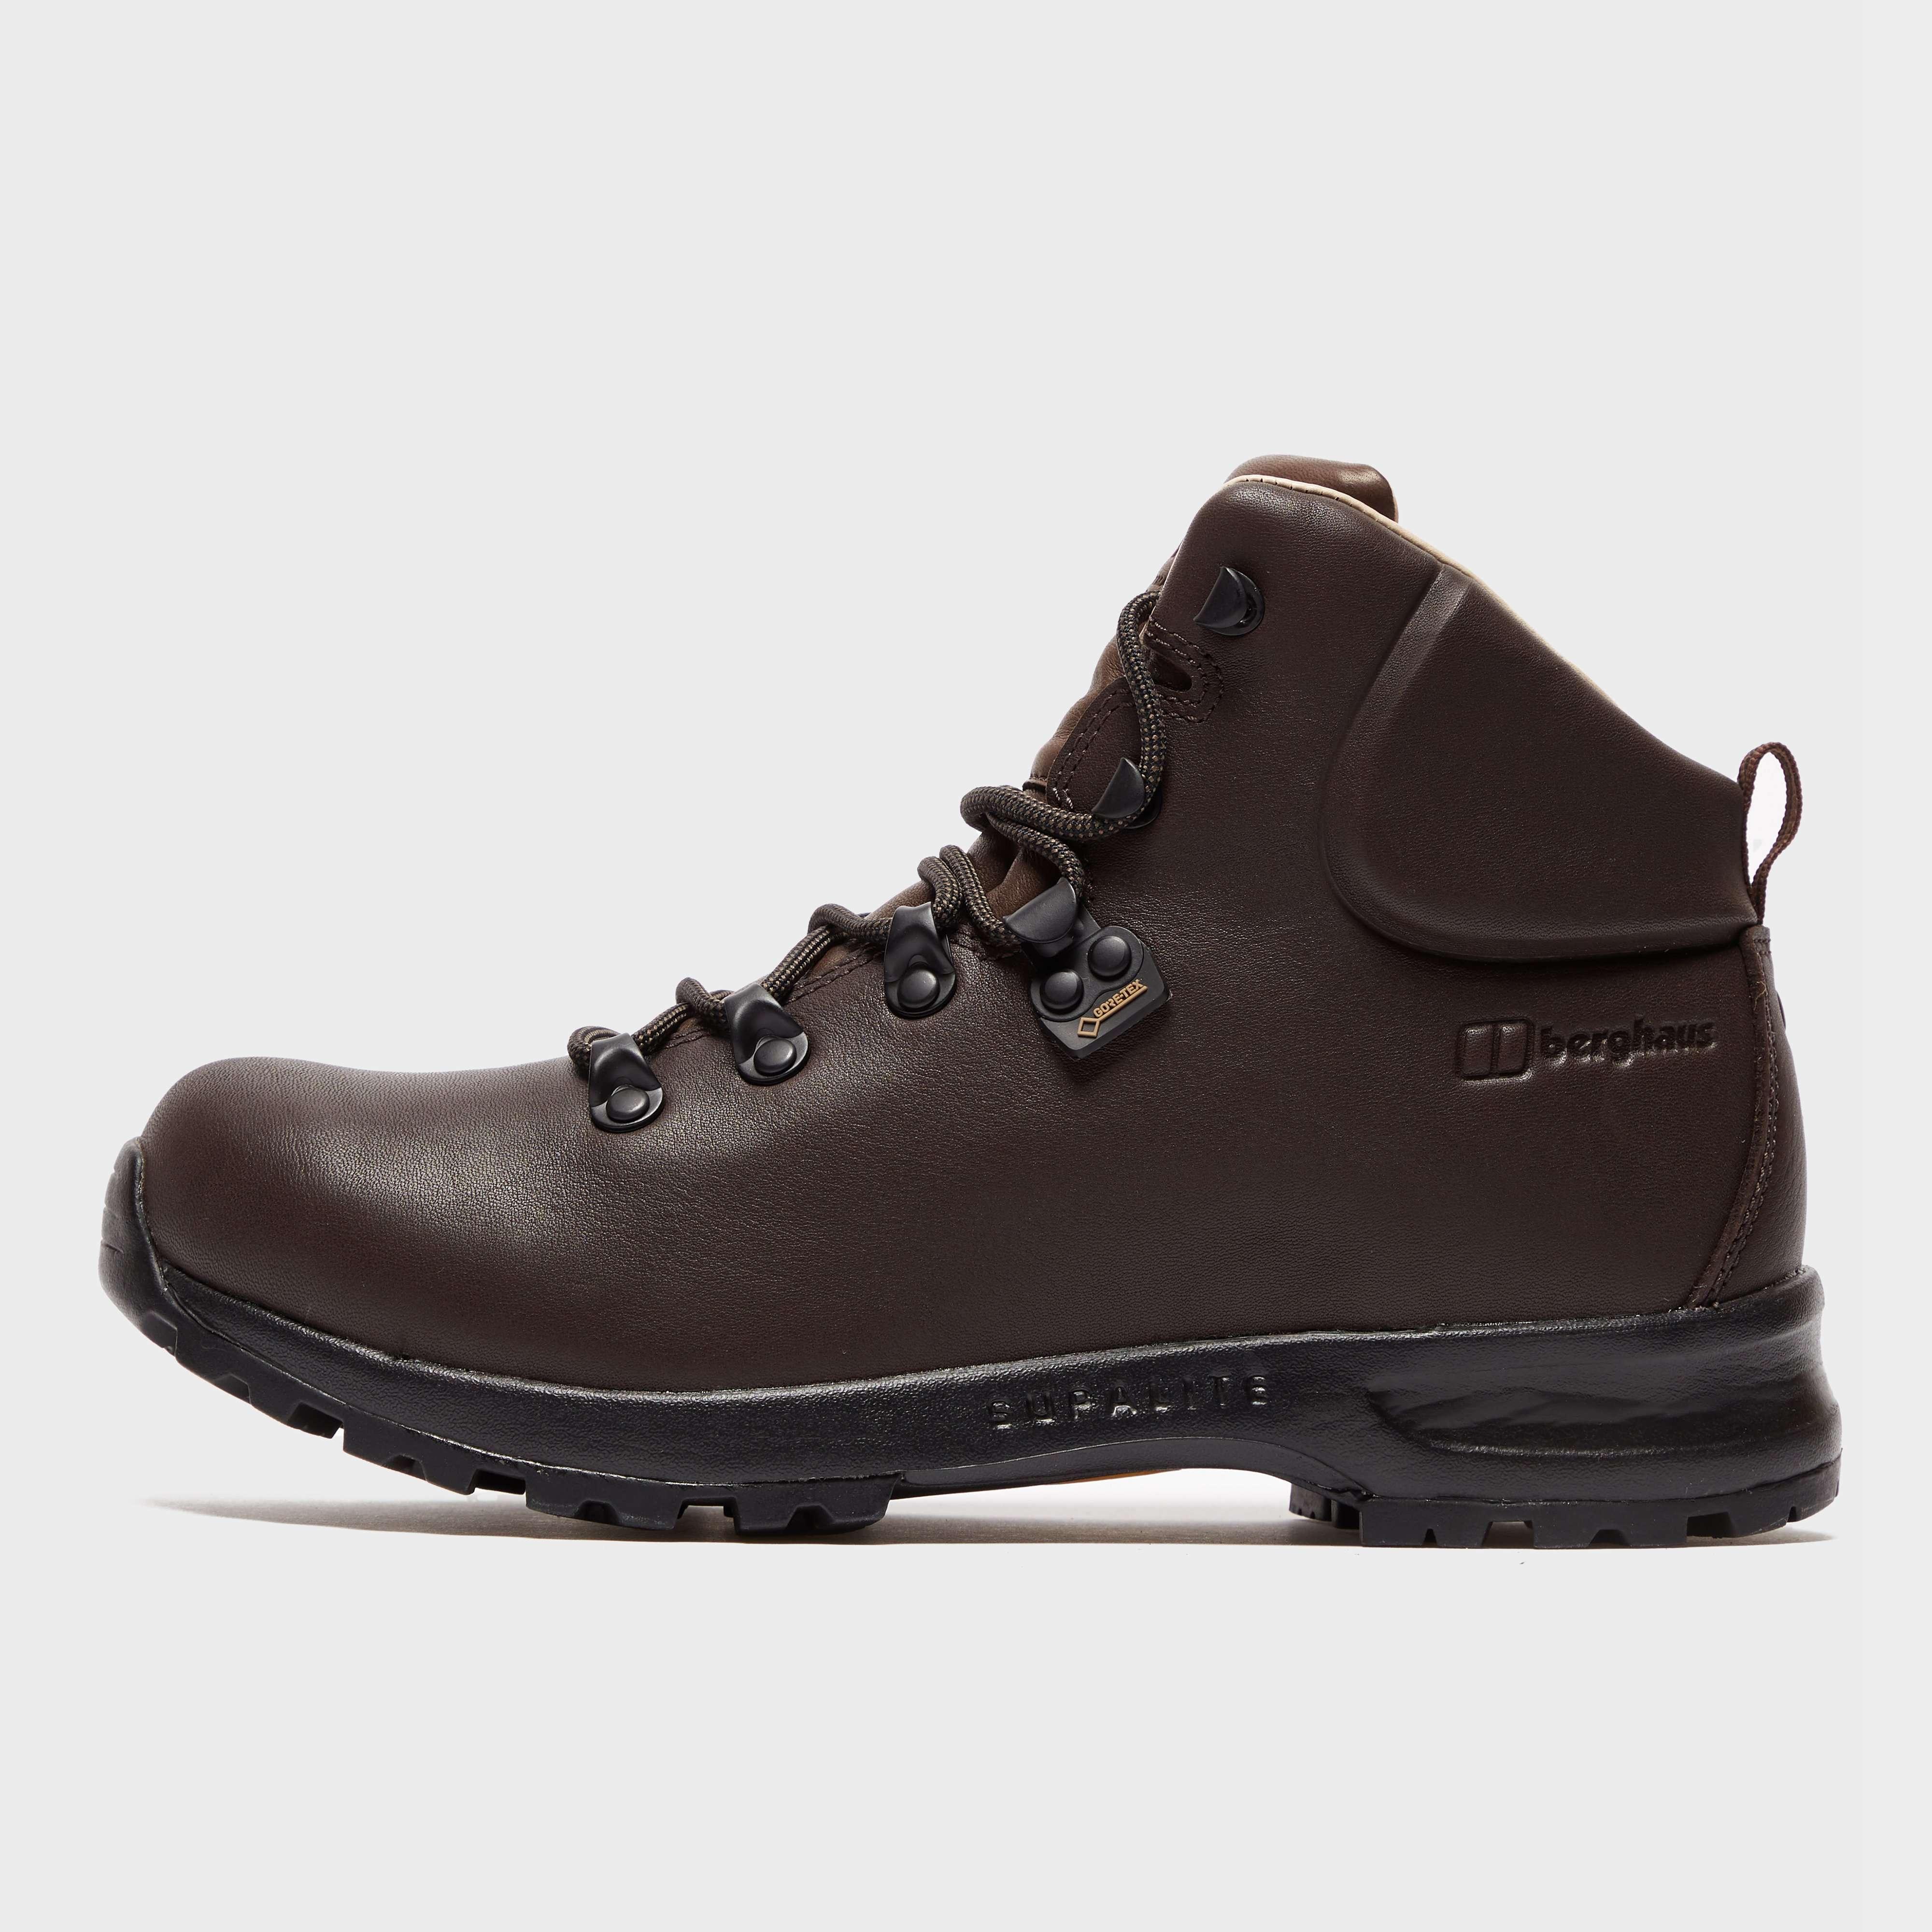 BERGHAUS Women's Supalite II GORE-TEX® Walking Boots